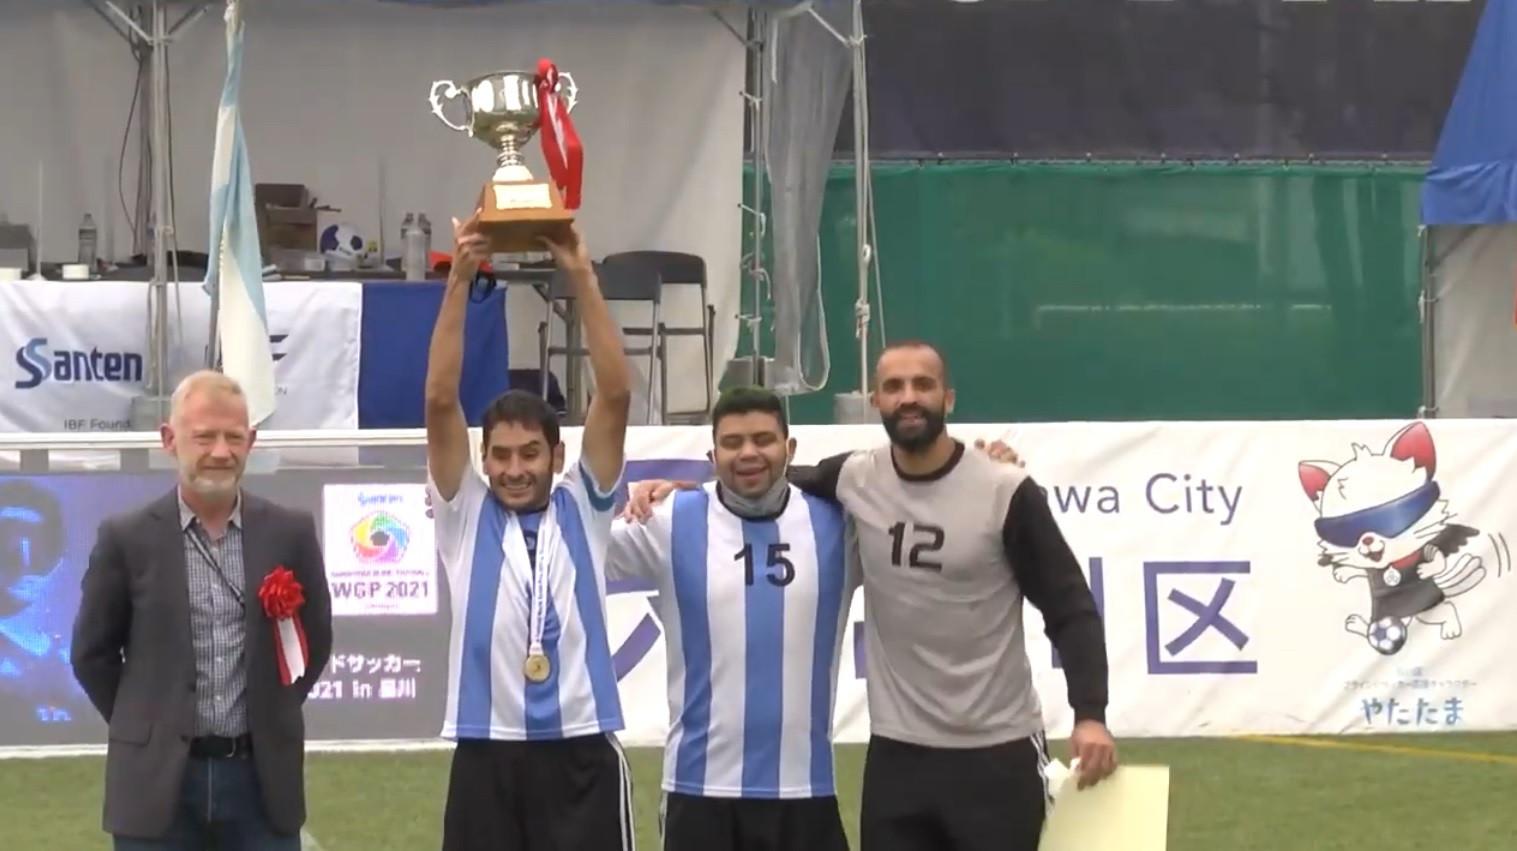 Argentina beat hosts Japan to win Blind Football World Grand Prix